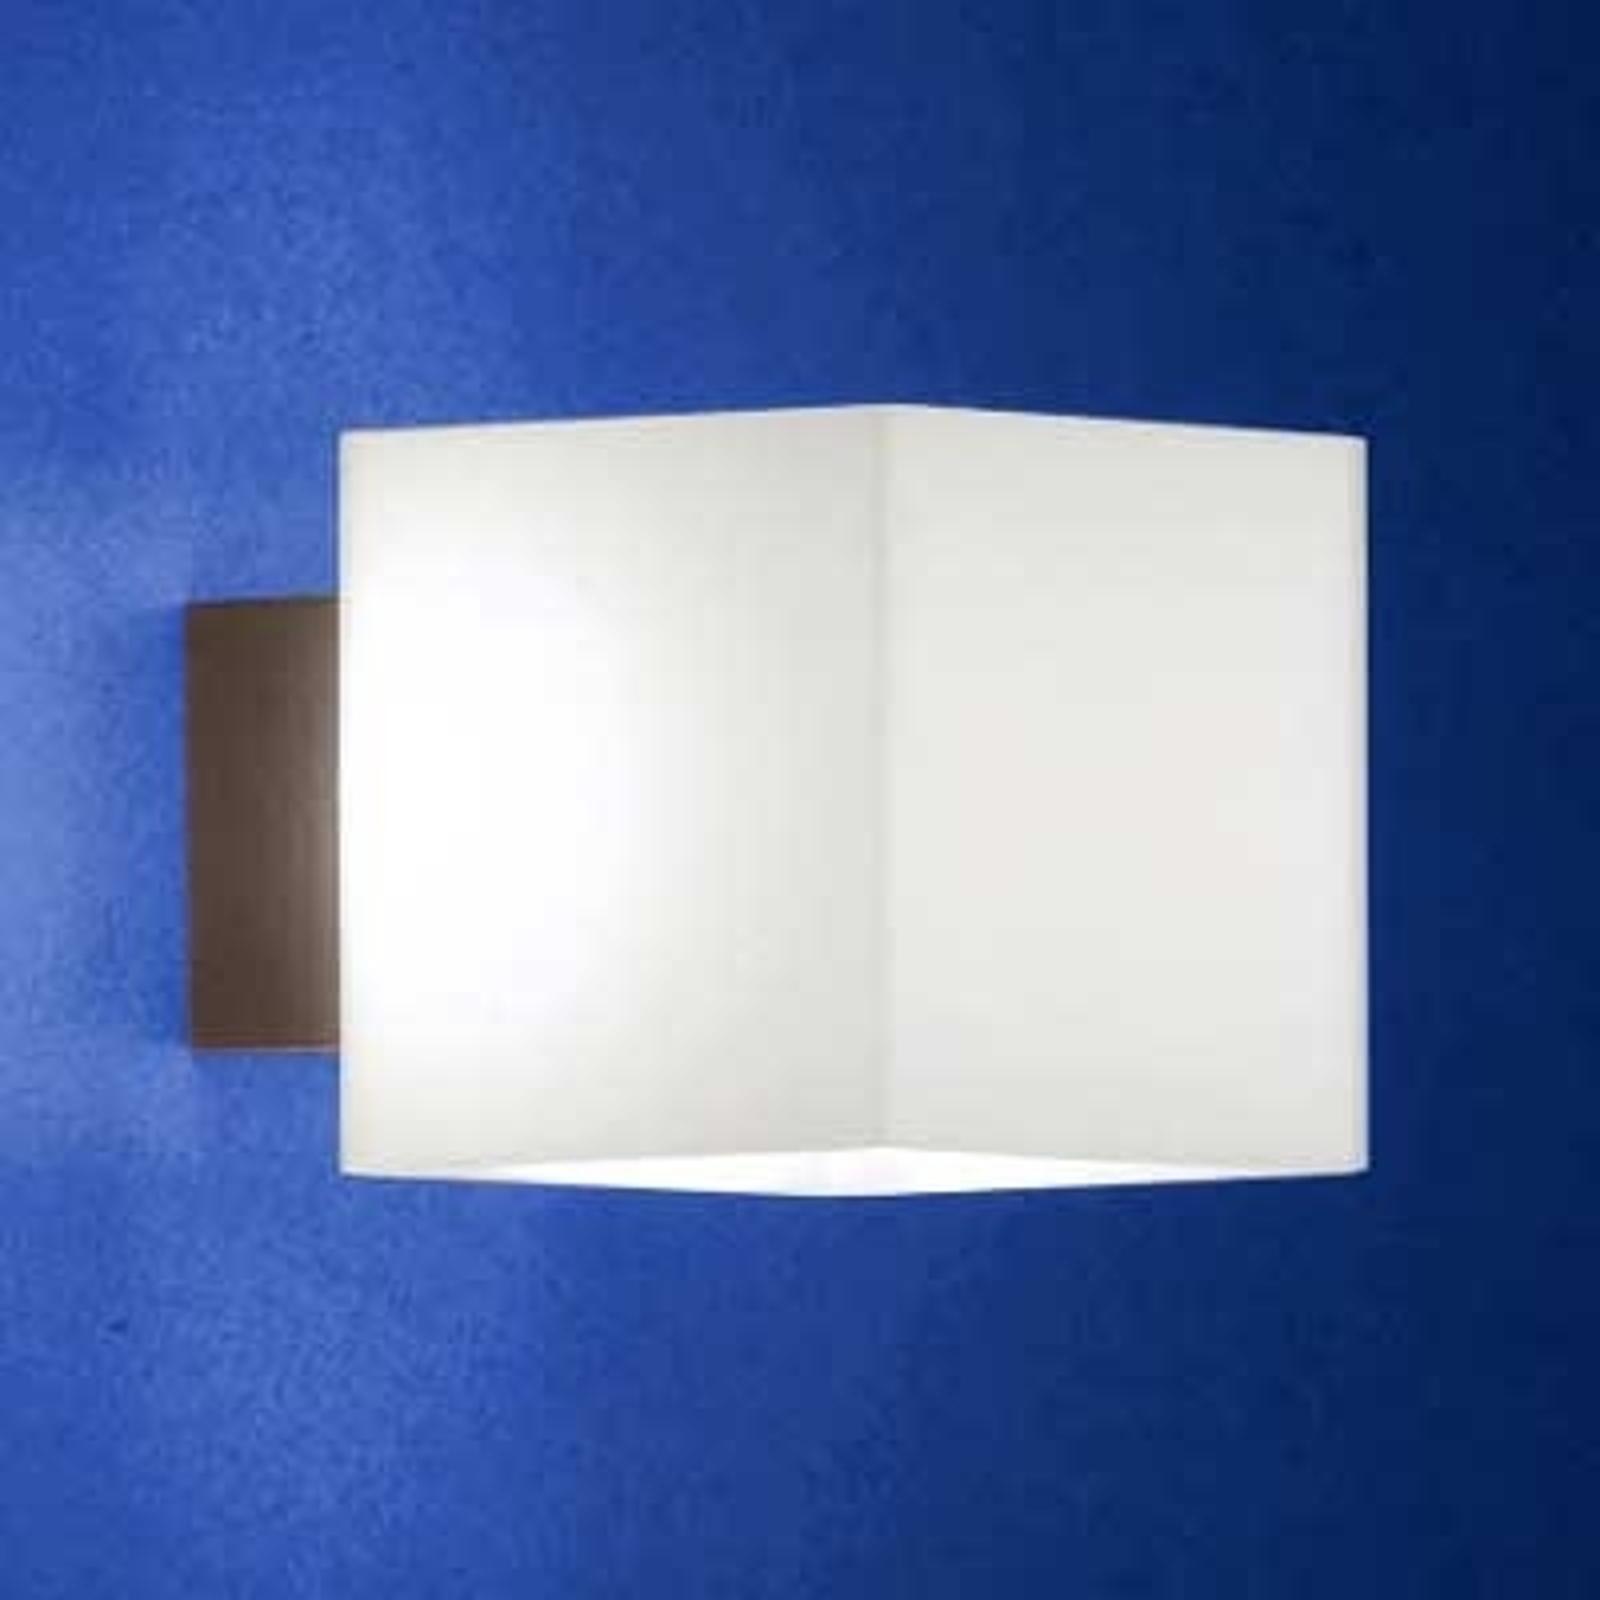 Anti-glare wall light CUBE_2000272_1